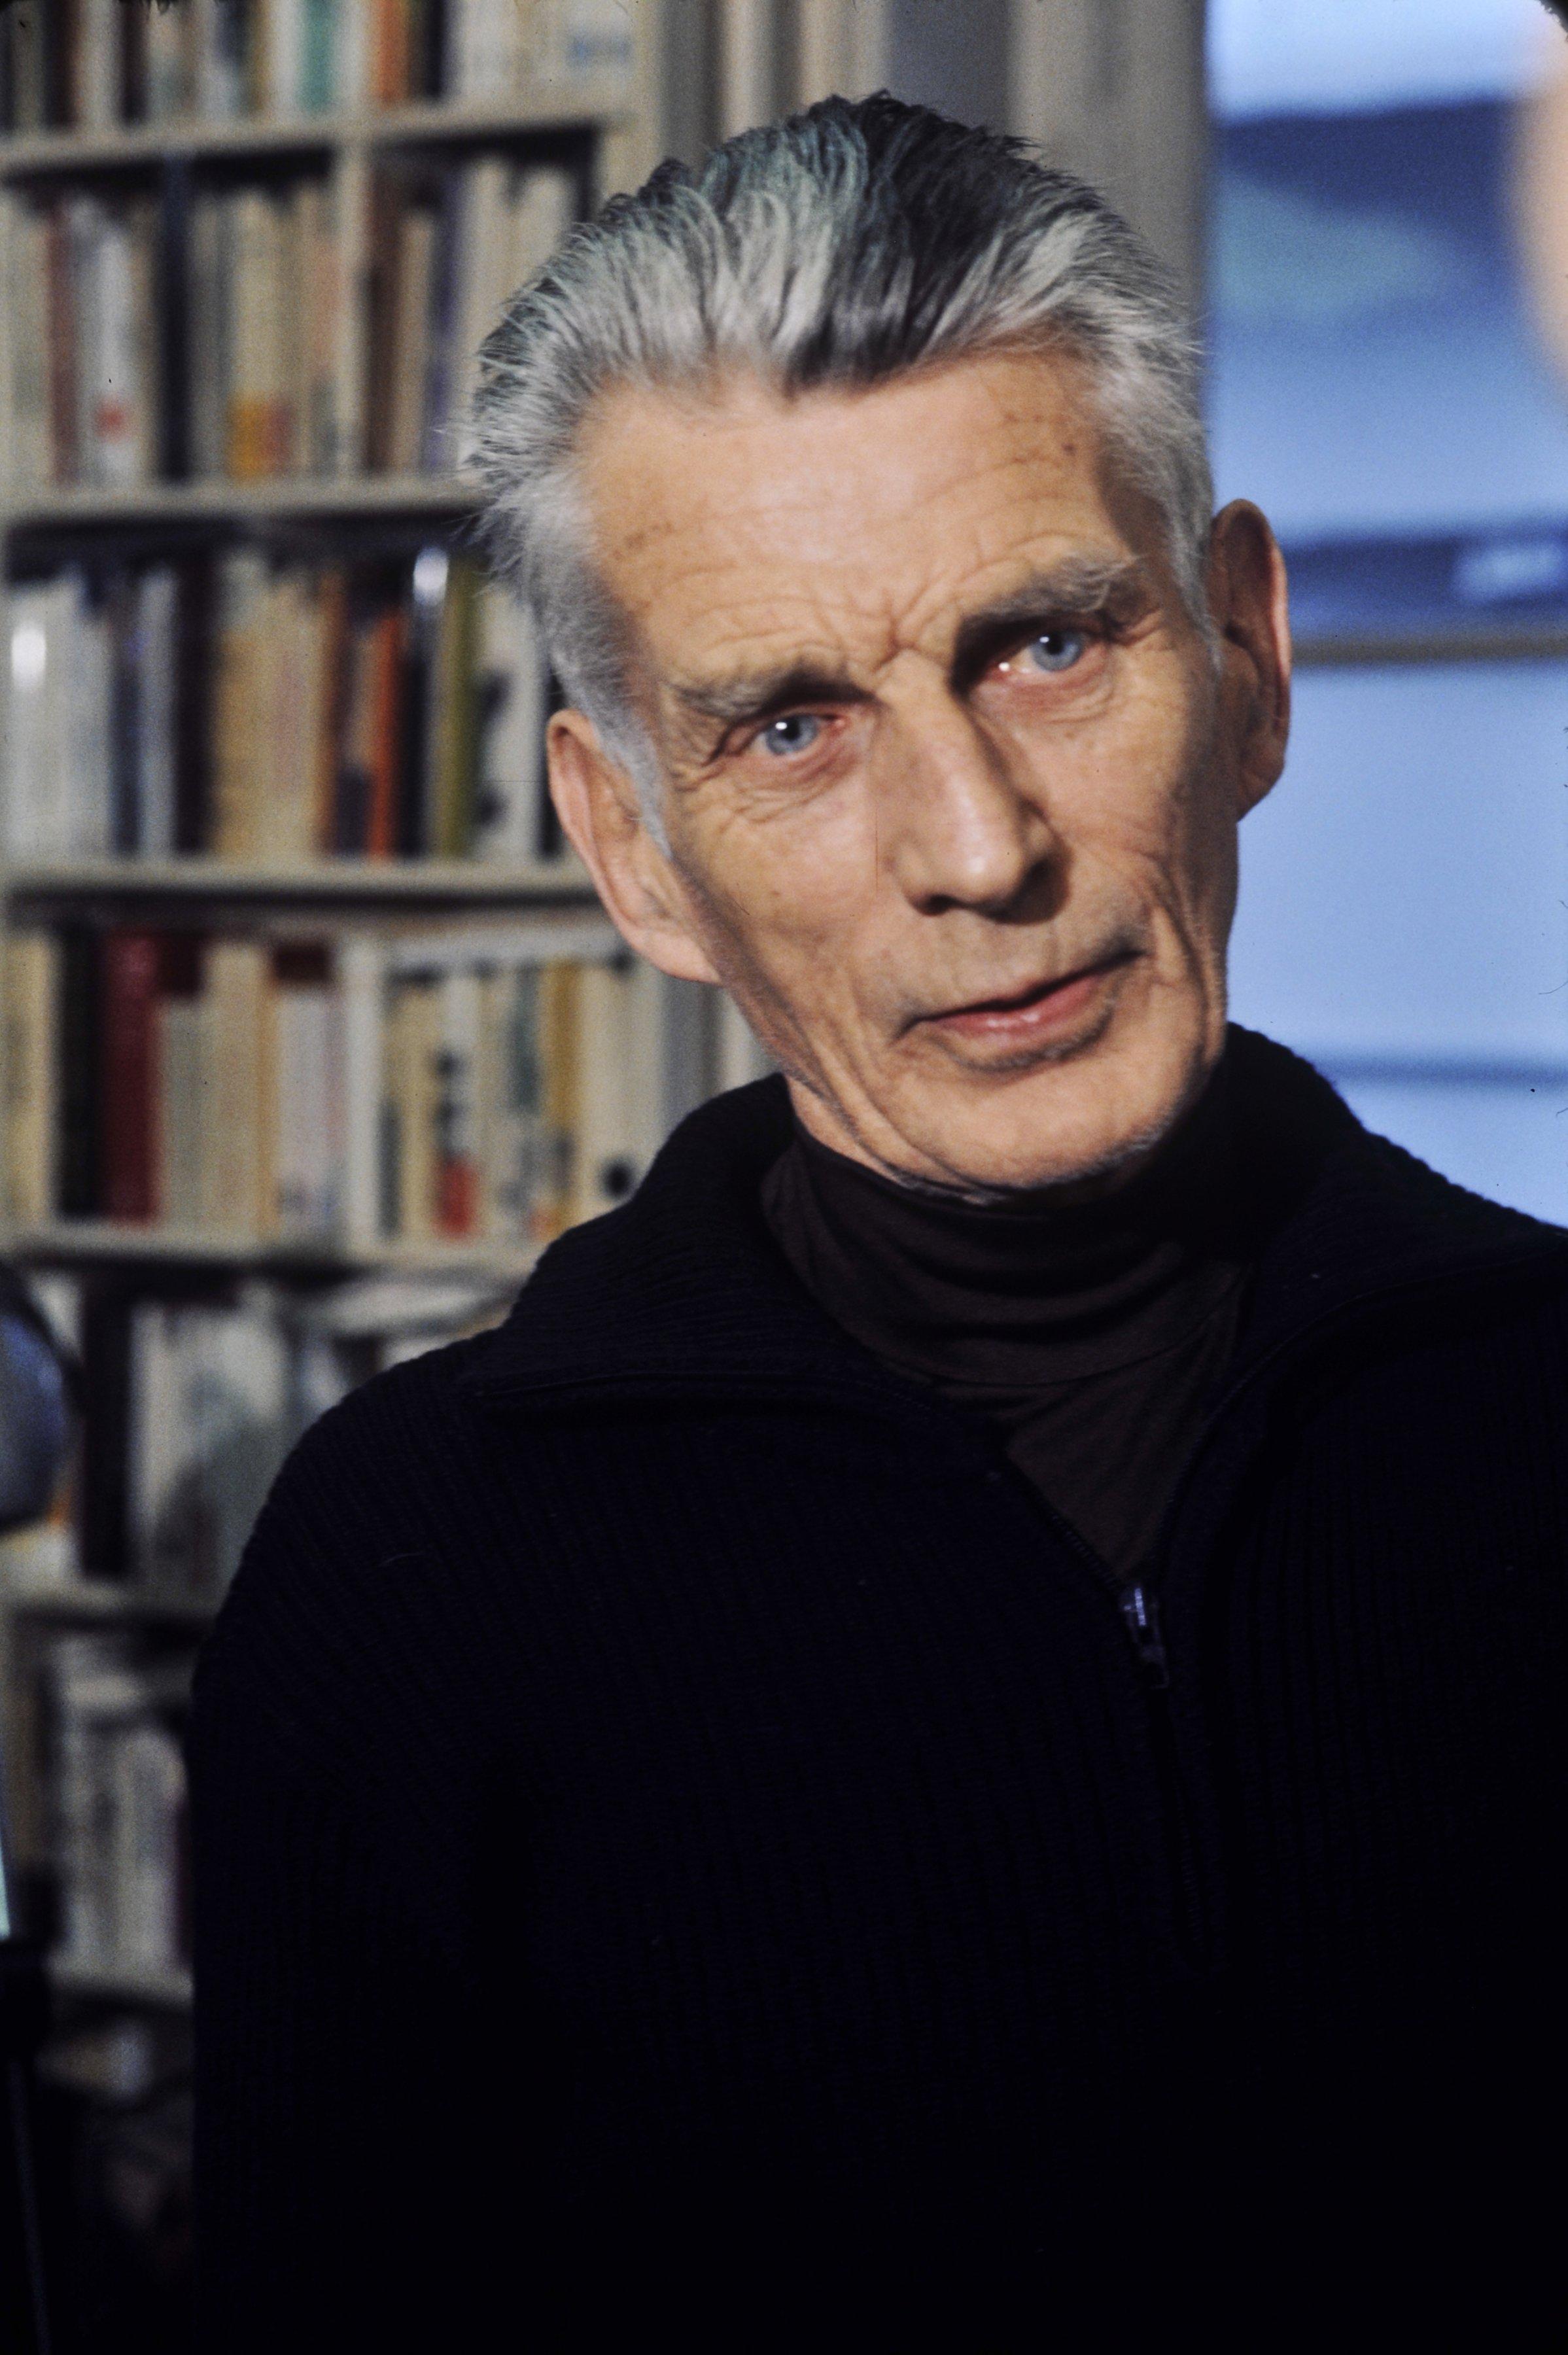 Samuel_Beckett,_Pic,_1.jpg